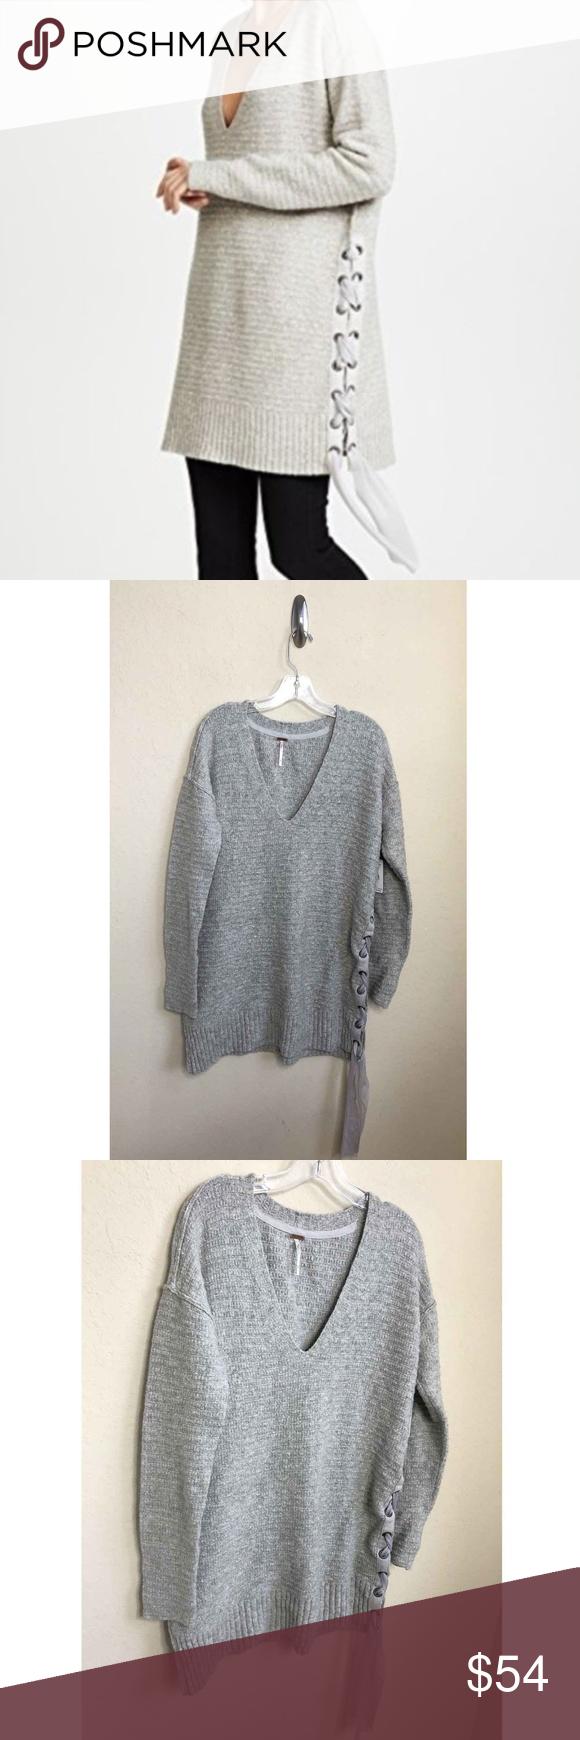 Free People Heart It Lace Up Sweater Tunic Size XS NWT Free People Heart It  Lace 69bf1e7c6